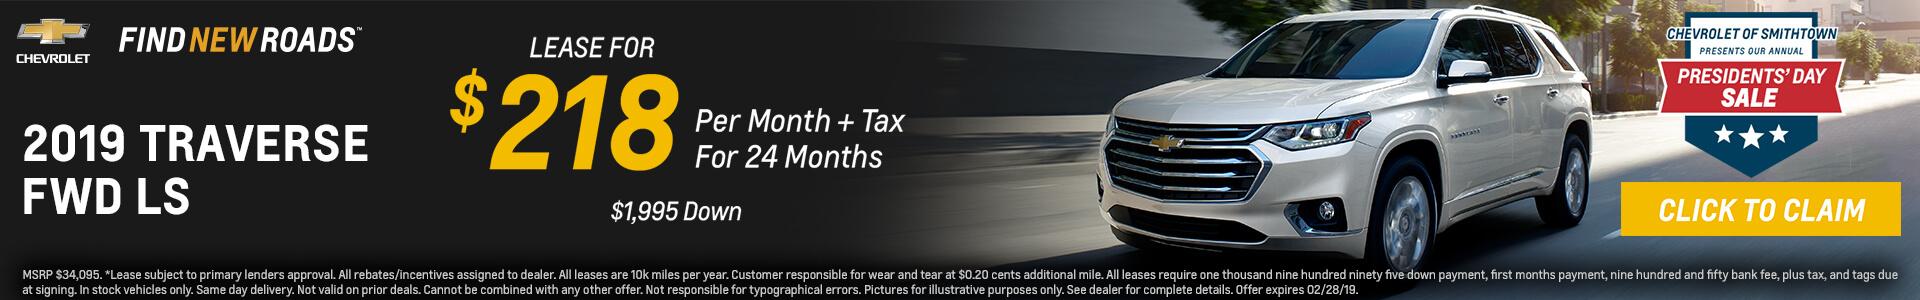 Chevrolet Traverse $218 Lease